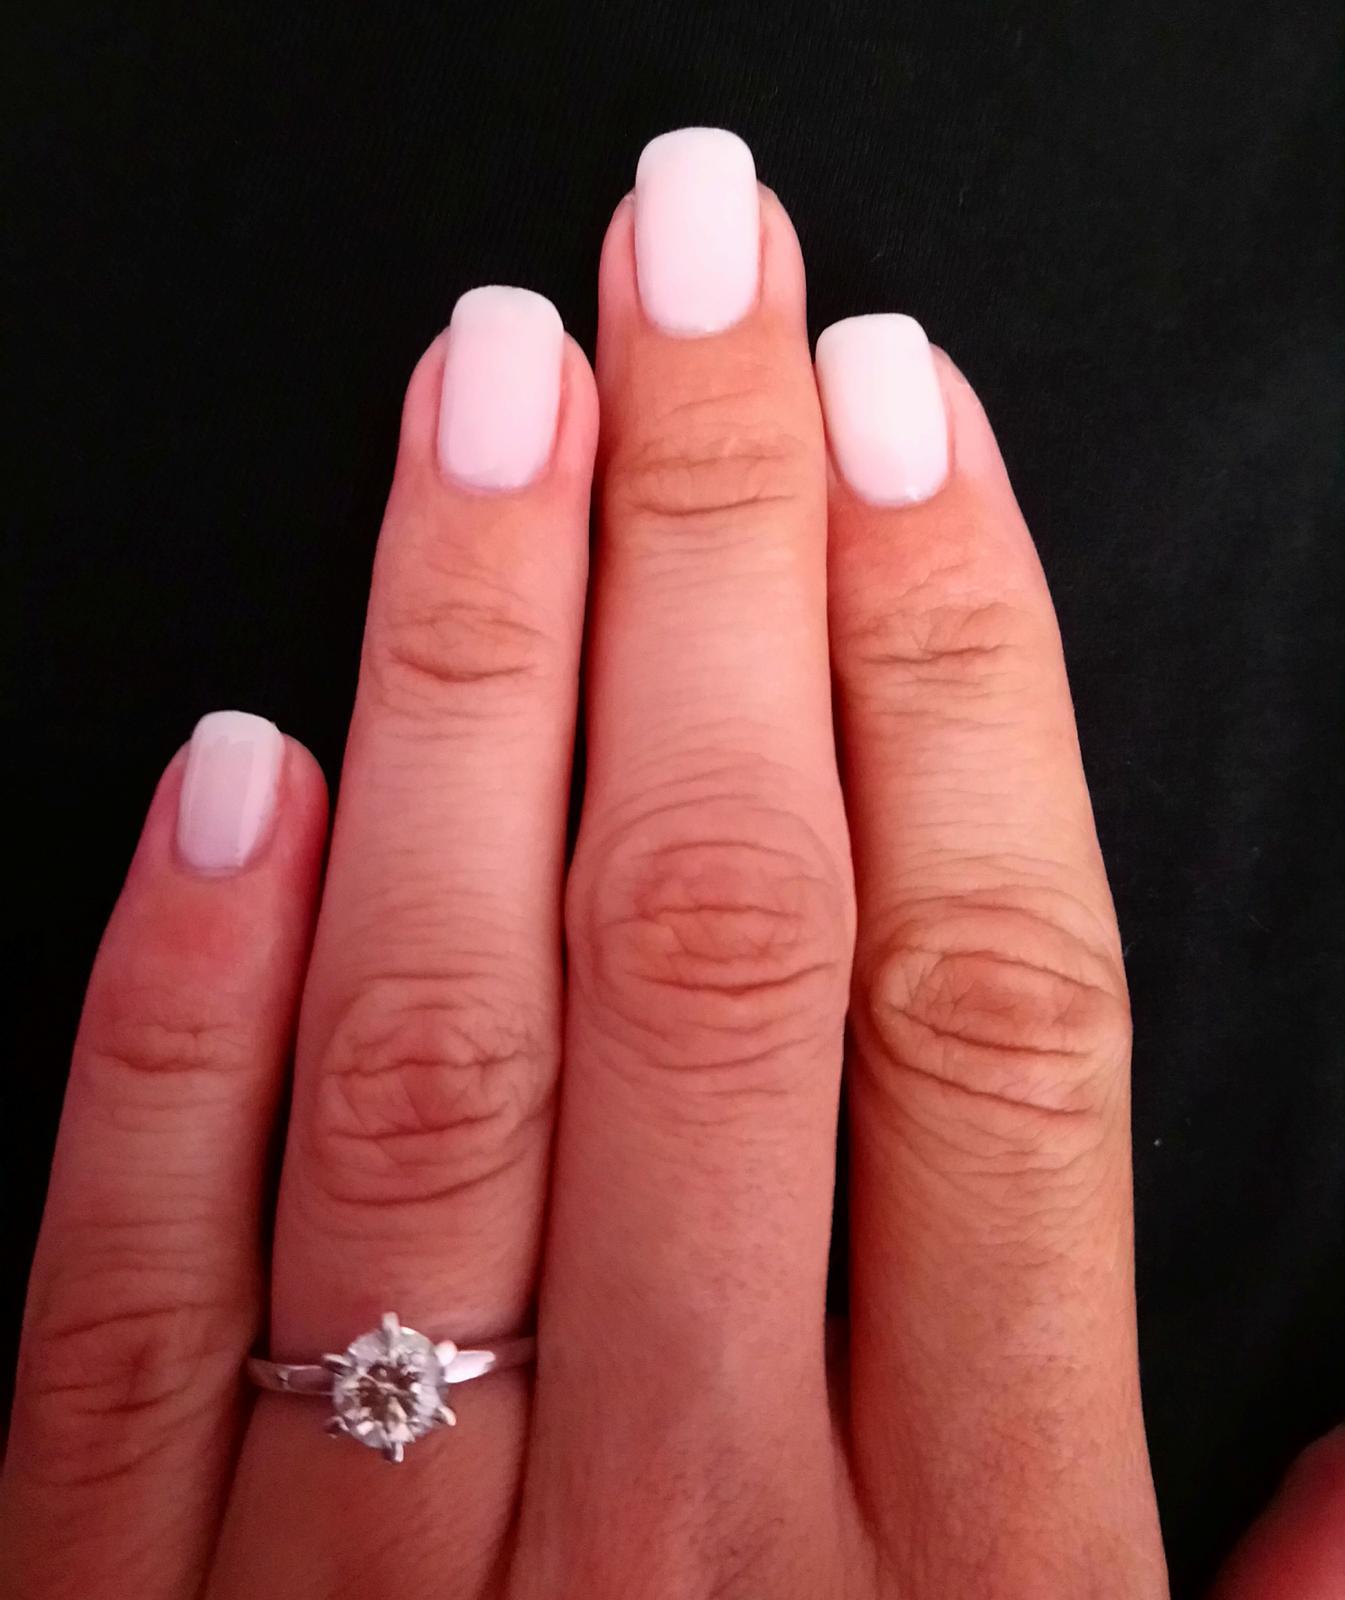 Nasa wellness svadba 5.10.2018 - Skuska manikury c. 1.. Ale asi zvolim trosku menej bielu a viac nude pink verziu..